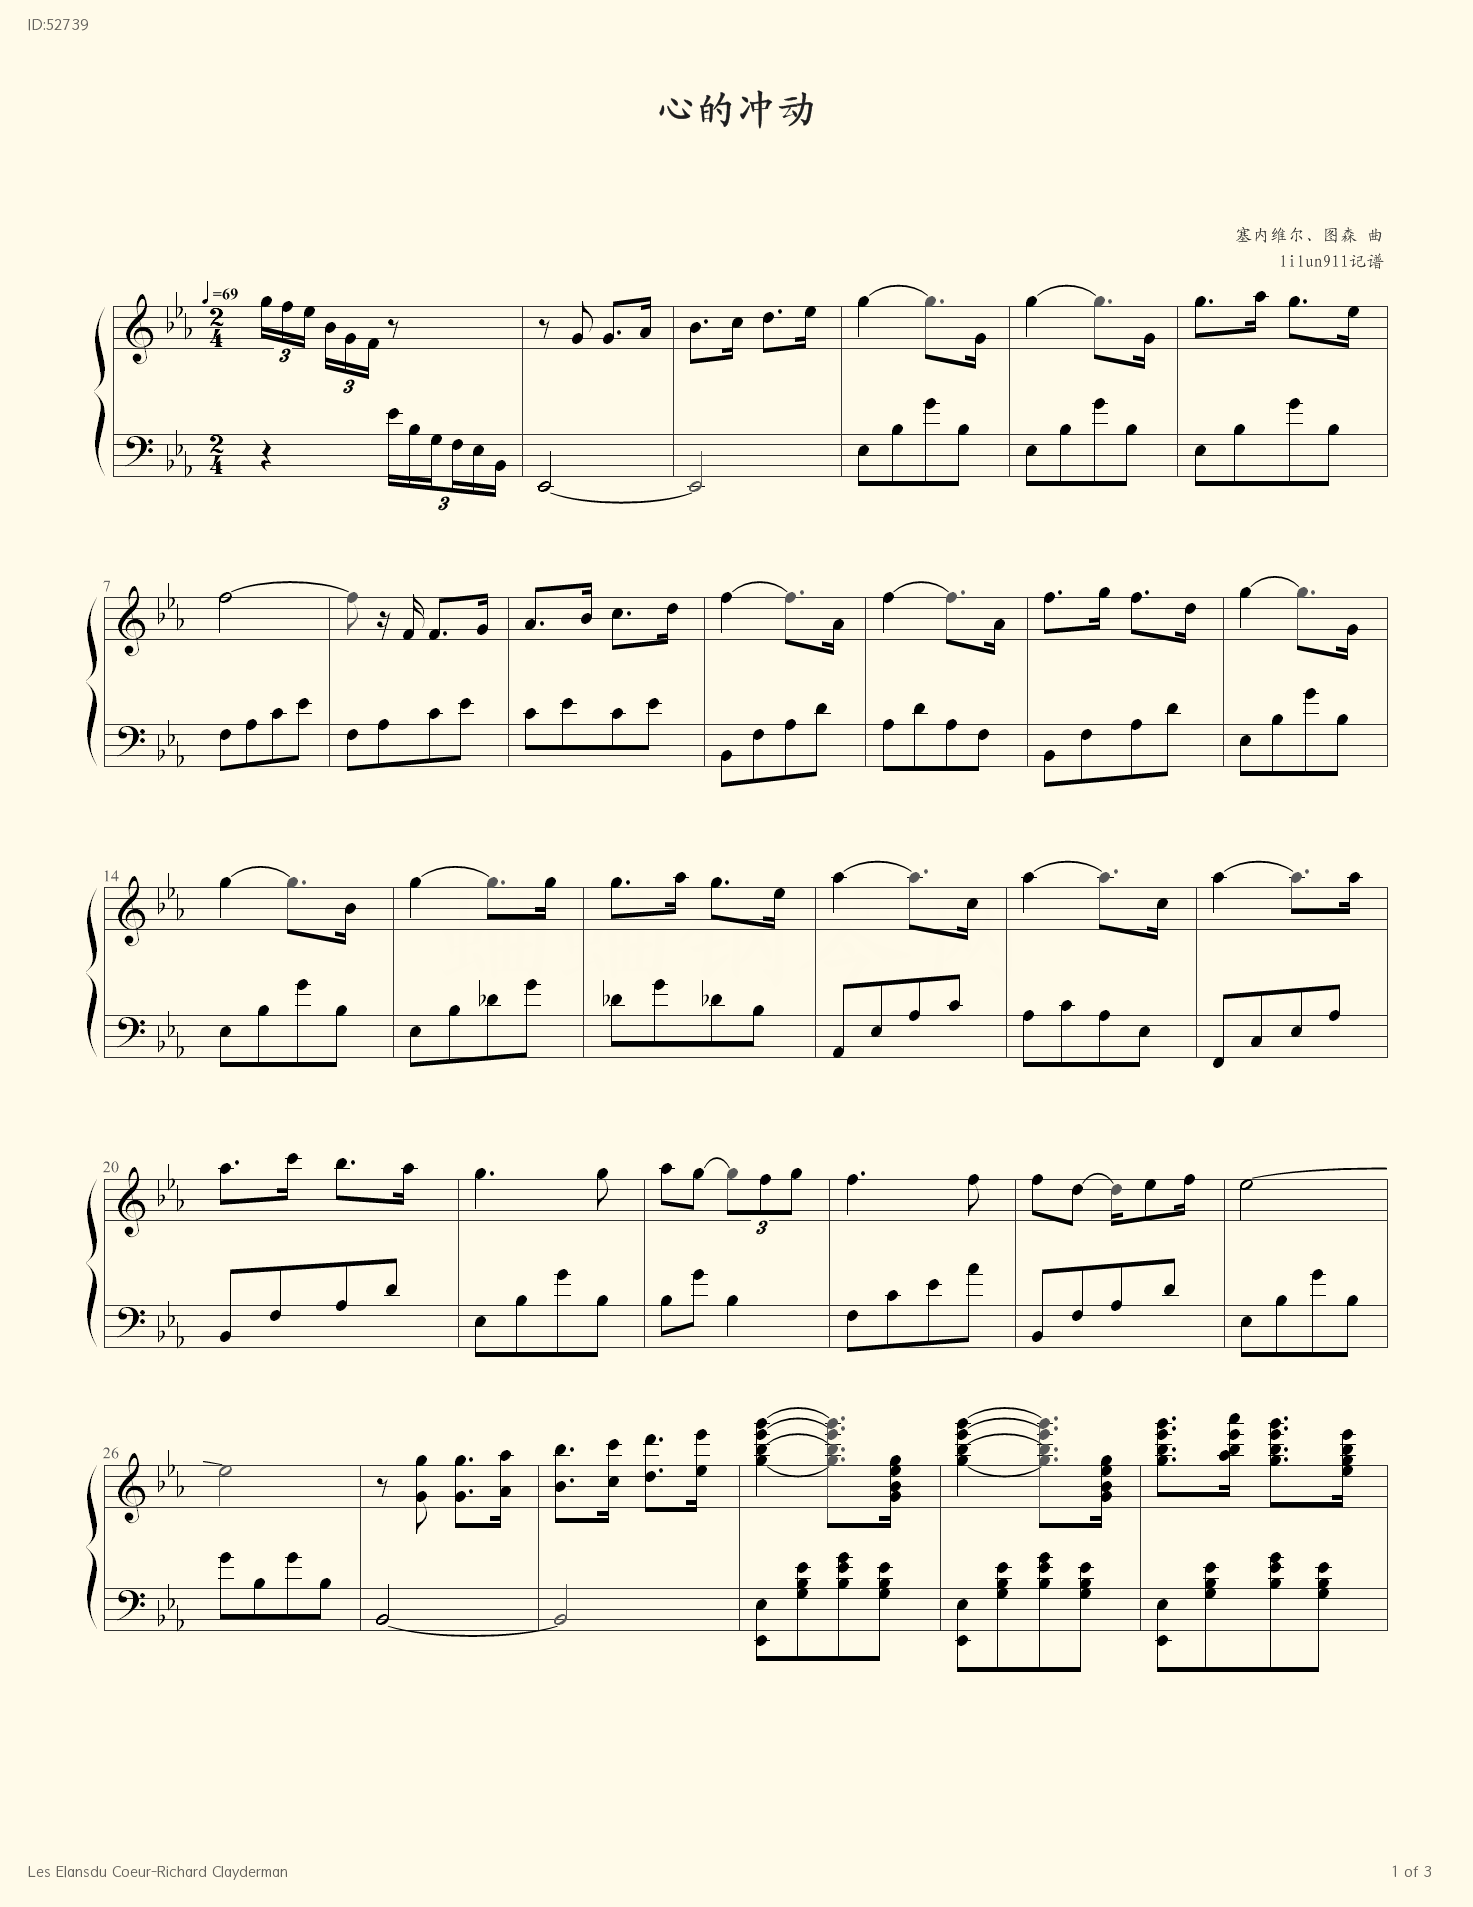 Les Elansdu Coeur Richard Clayderman - Richard Clayderman - first page